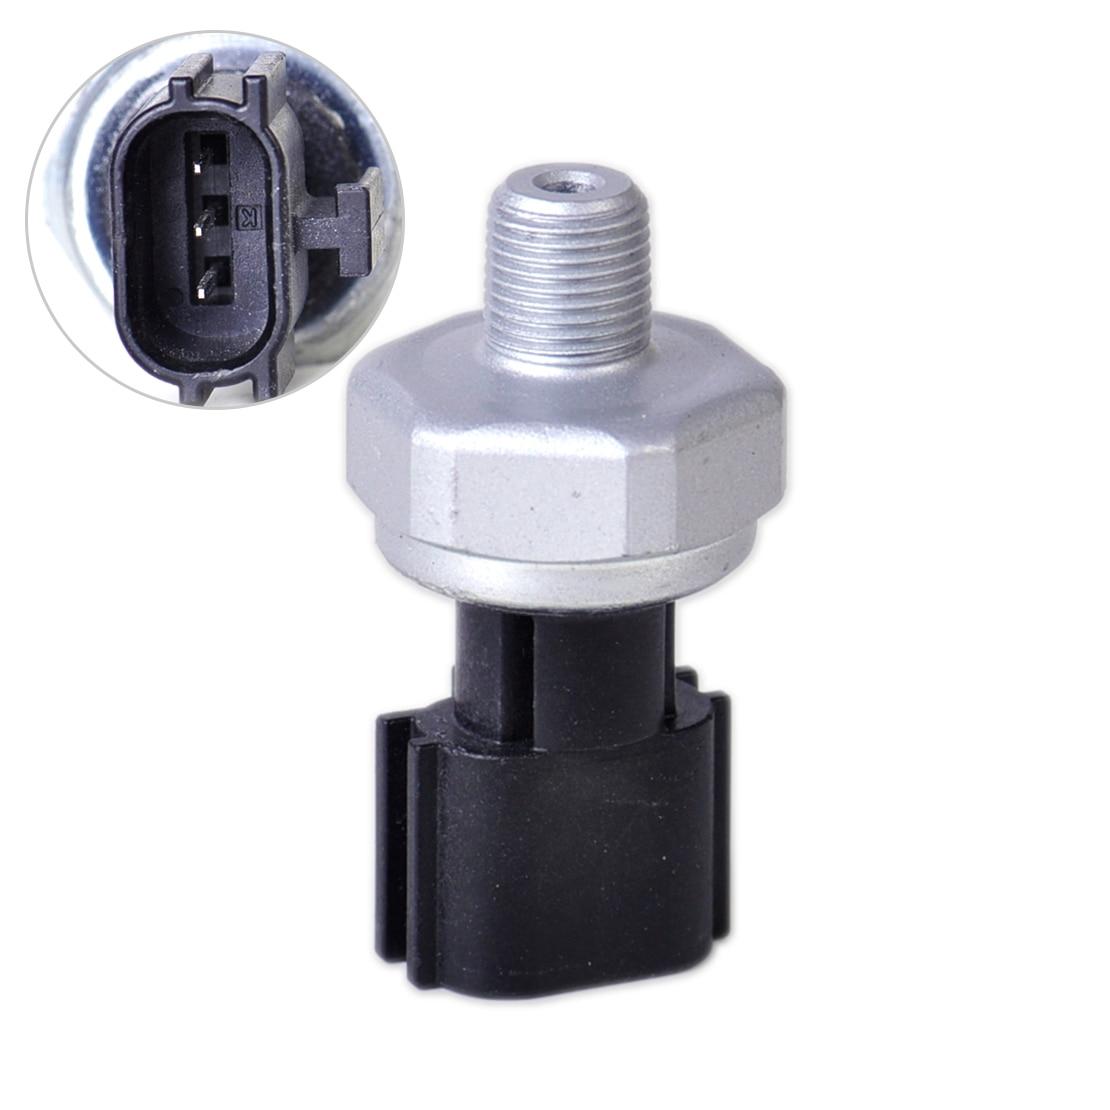 NEW Oil Pressure SENSOR Sender Switch FITS SENTRA ALTIMA PATHFINDER 25070-CD000